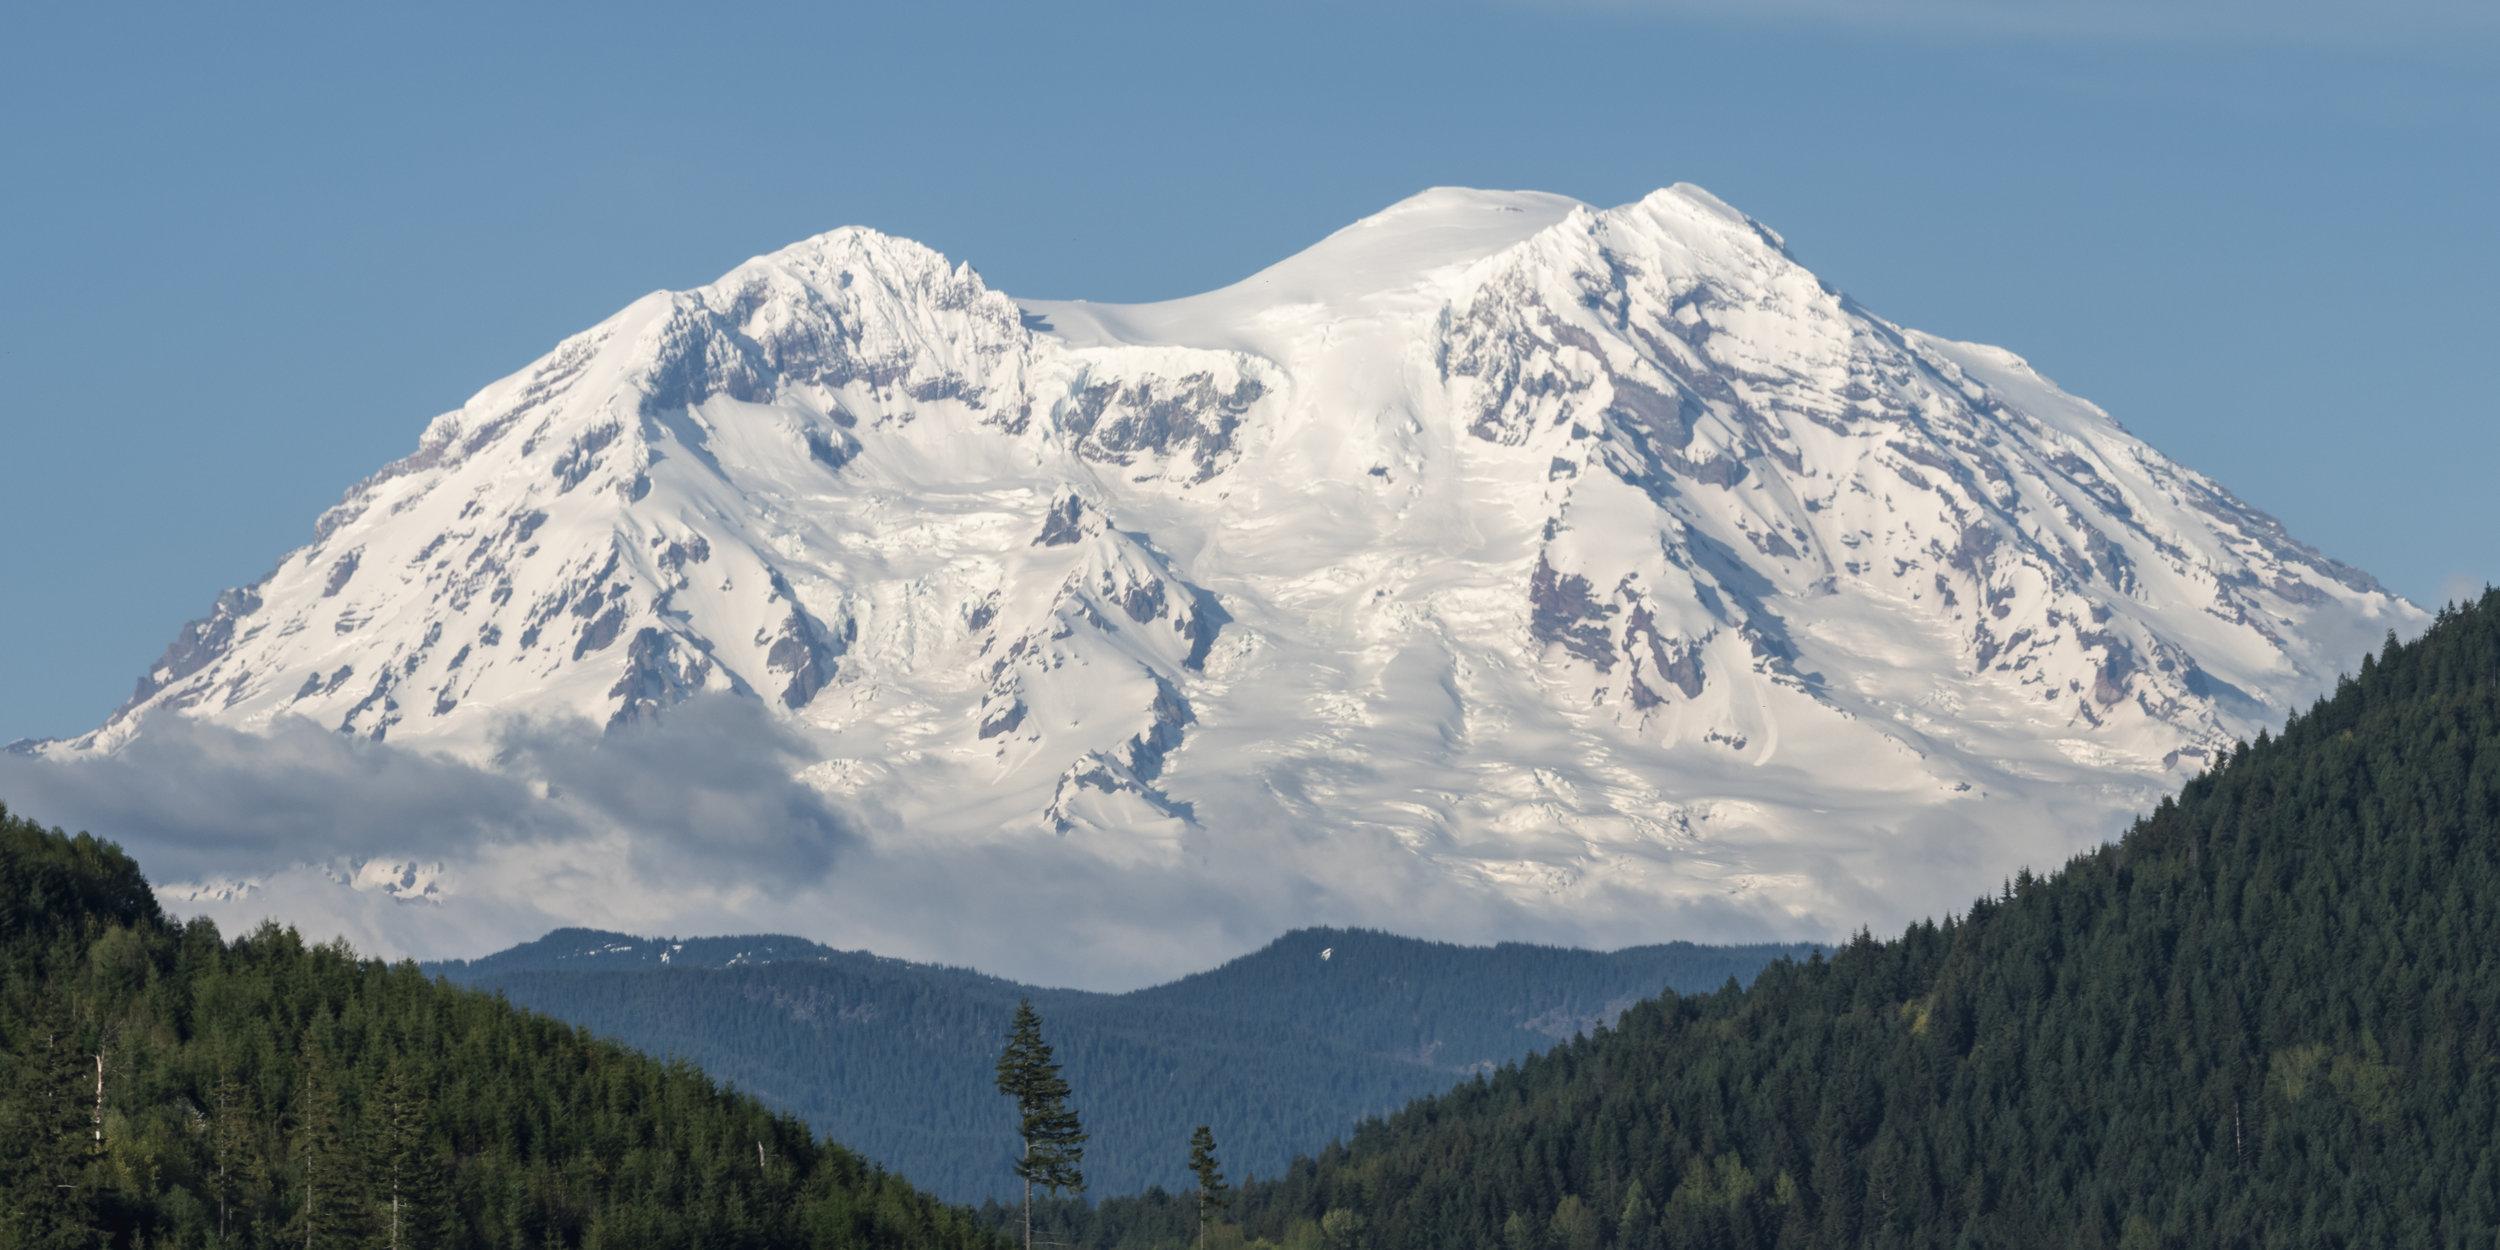 Mt_Rainier_Nature_Background.jpg